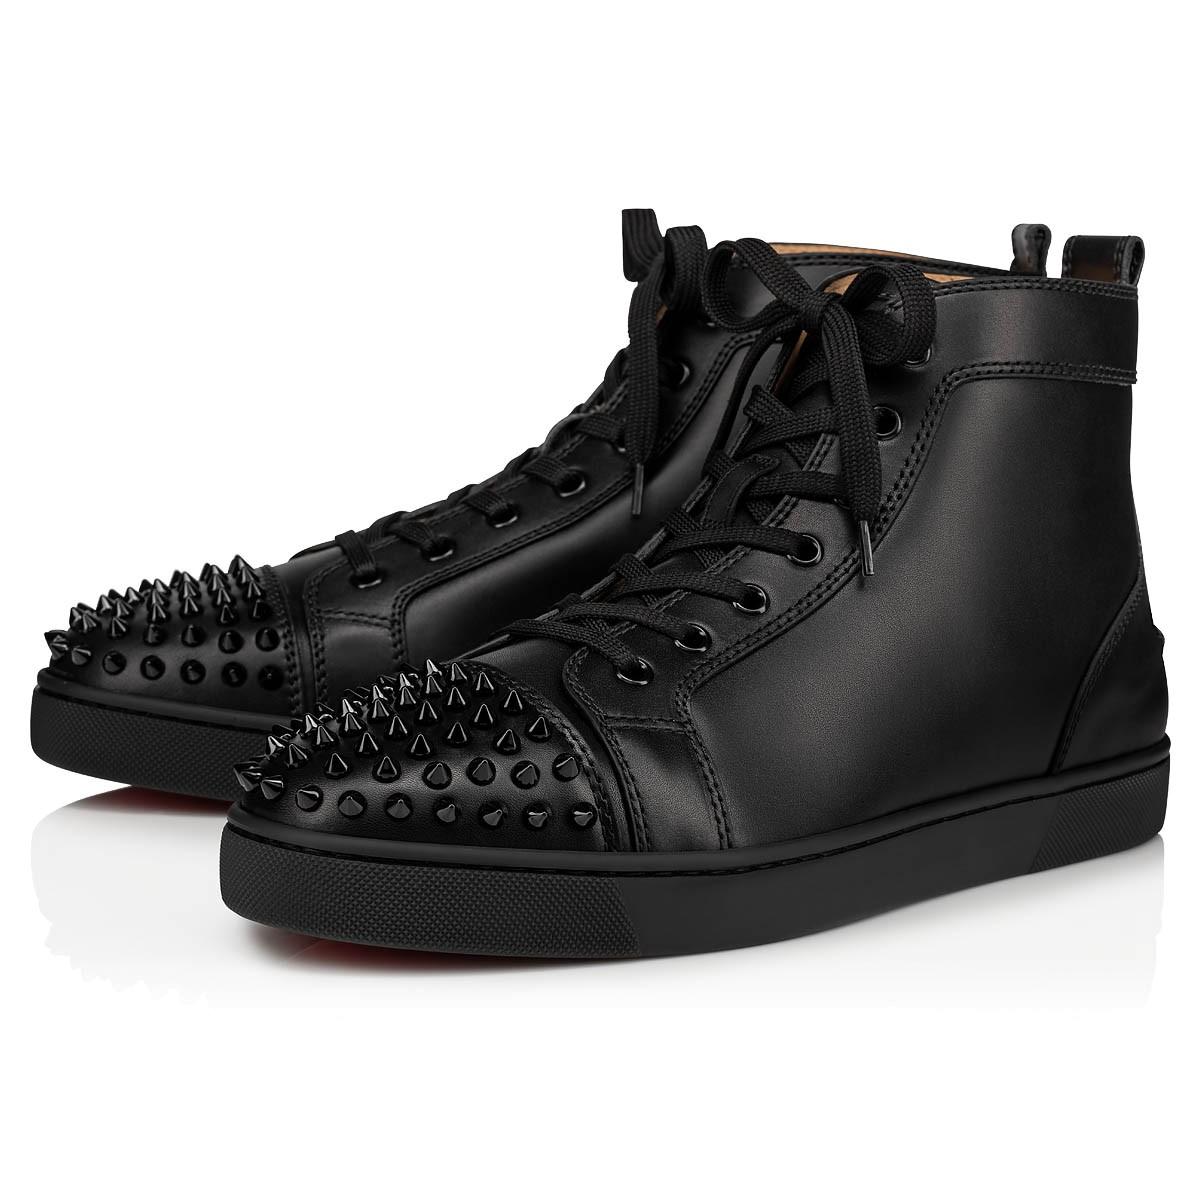 鞋履 - Lou Spikes - Christian Louboutin